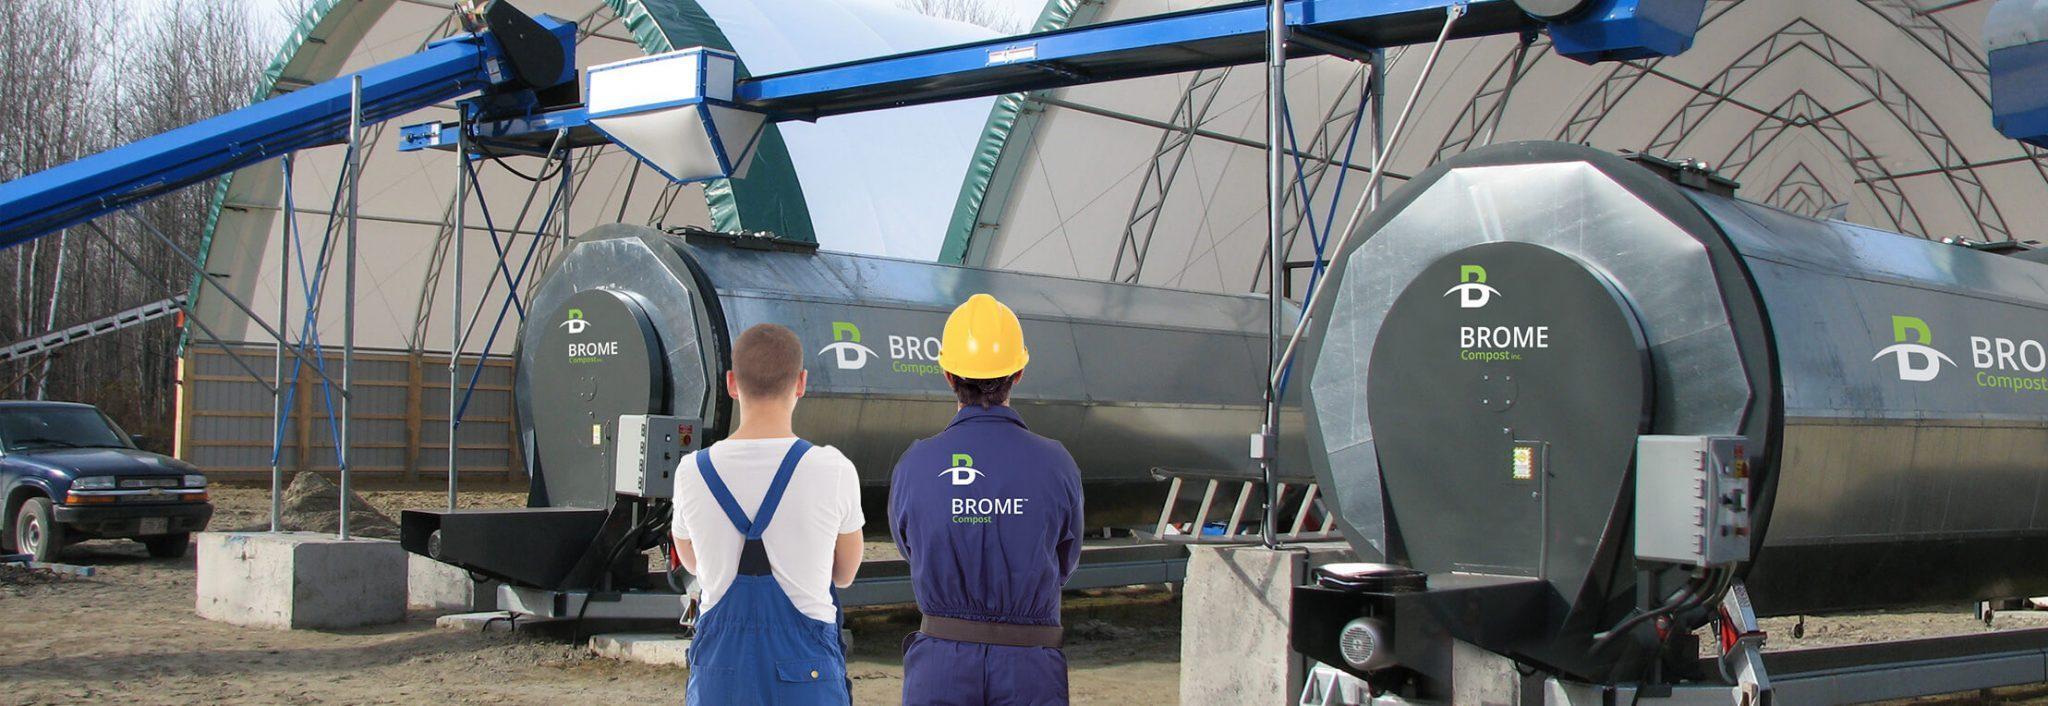 Système de compostage industriel et modulaire pour vos besoins spécifiques. BROME industrial compsoting systems are modulaire to adapt to your specific needs.